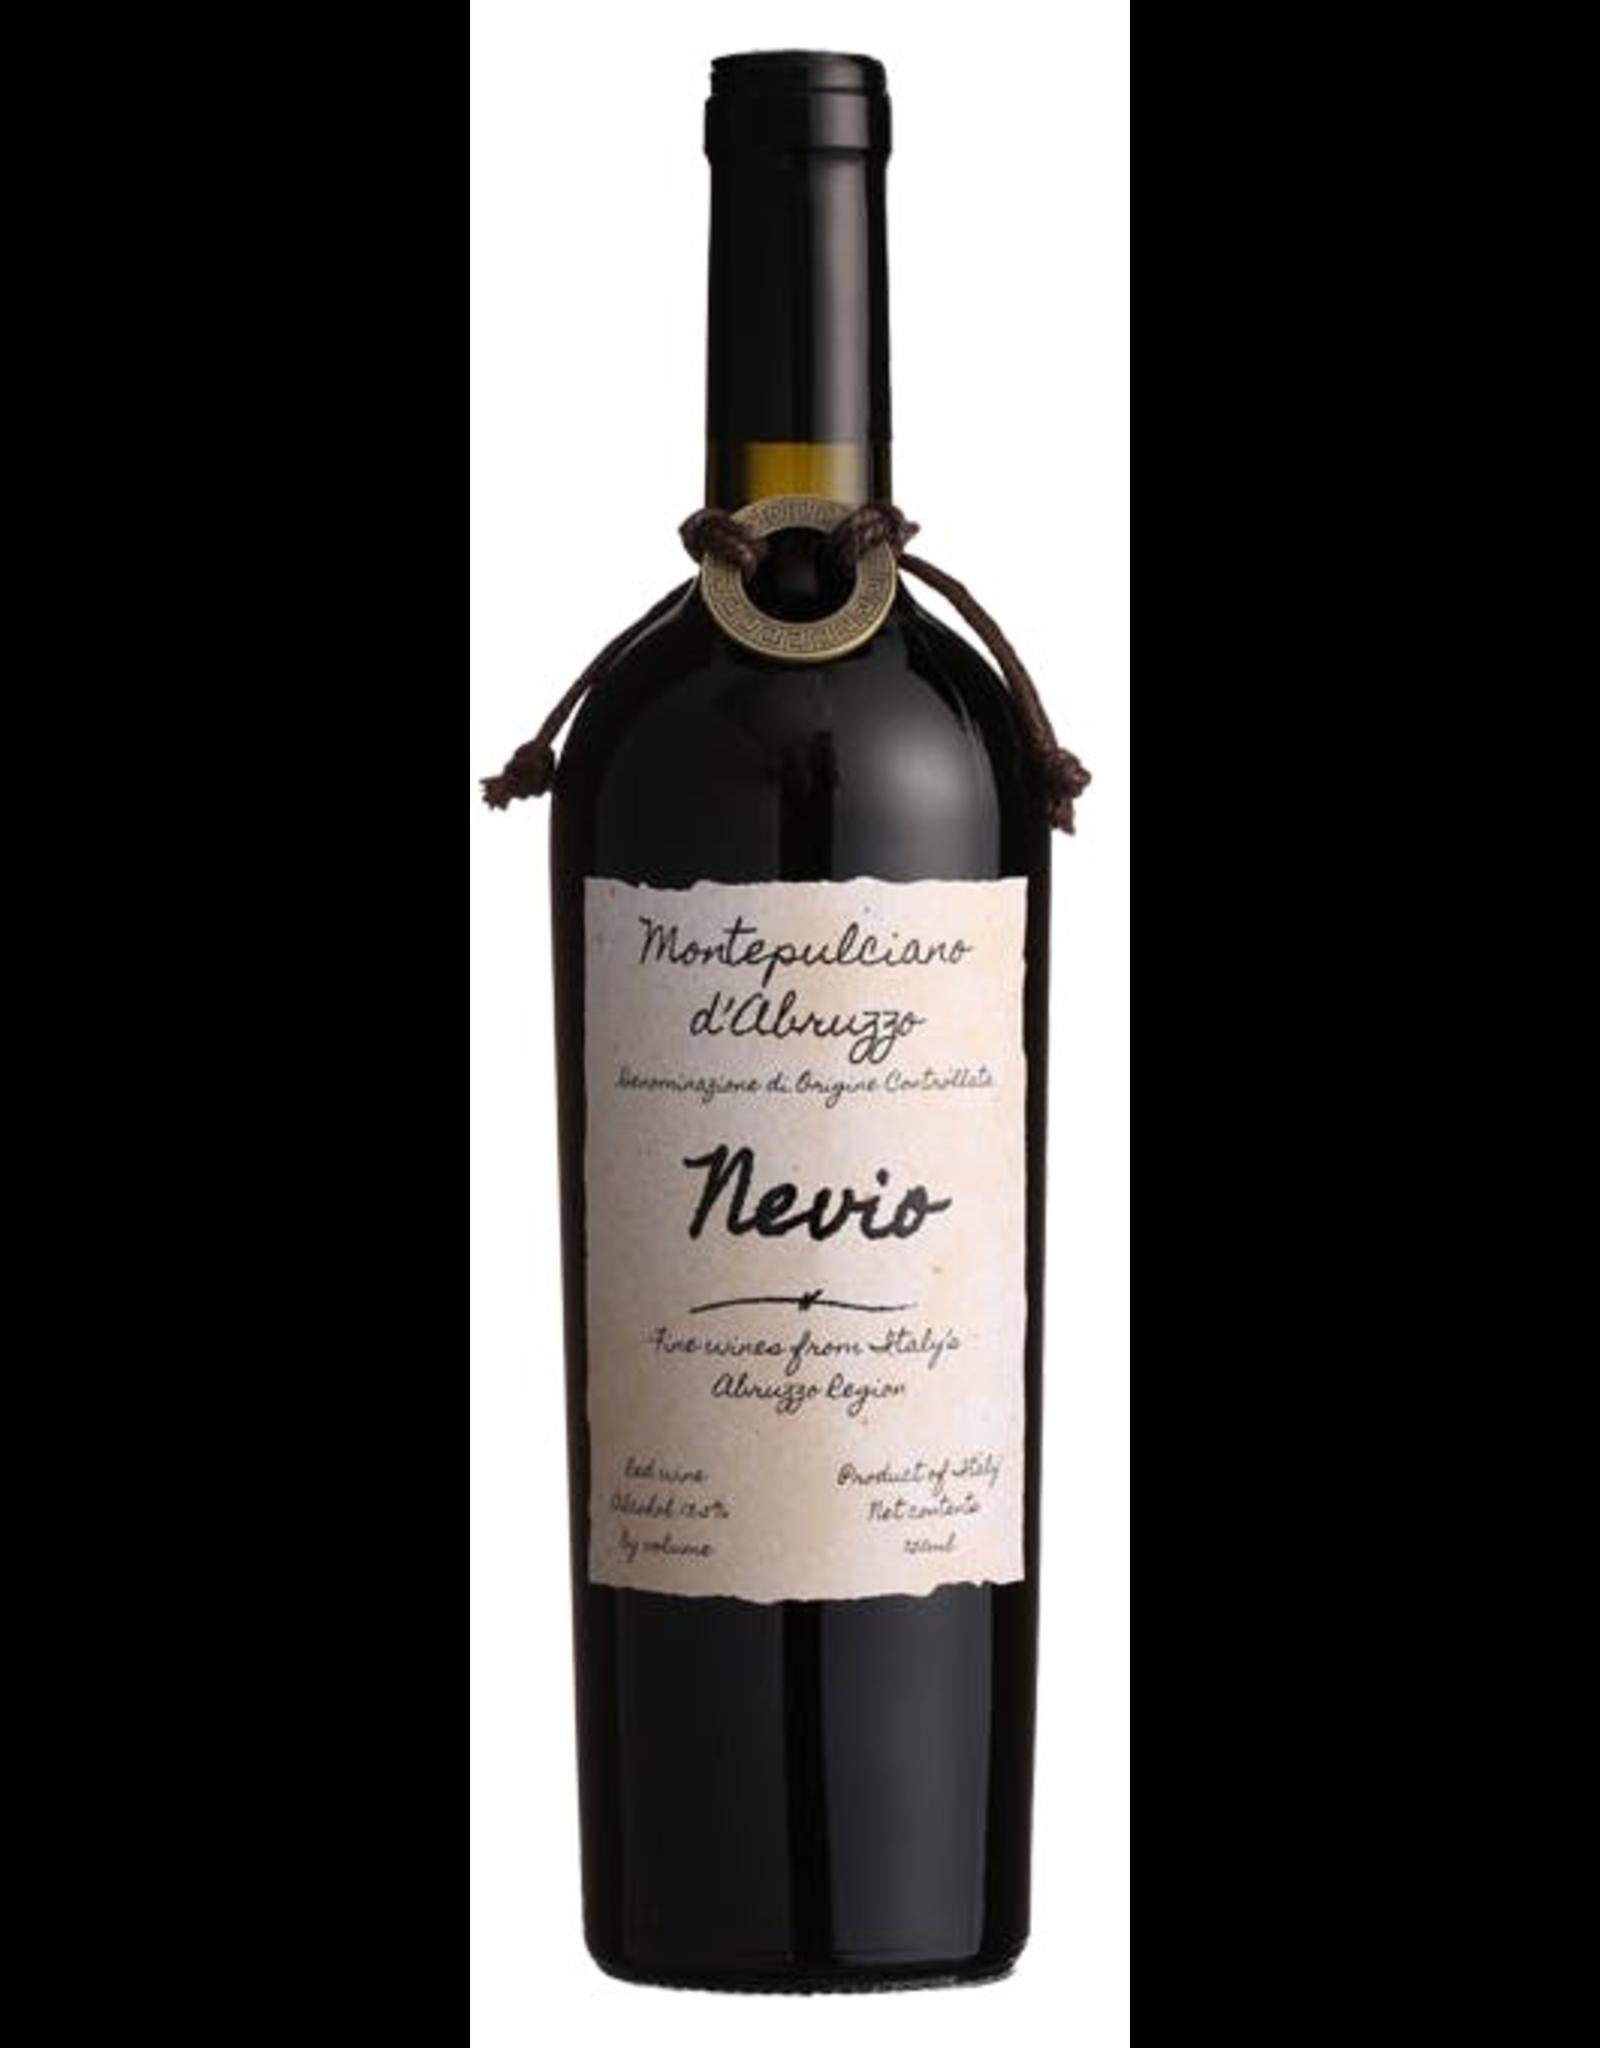 Red Wine 2017, Nevio, Montepulciano, San Marino, Montepulciano d'Abruzzo, Italy, 13.5% Alc,